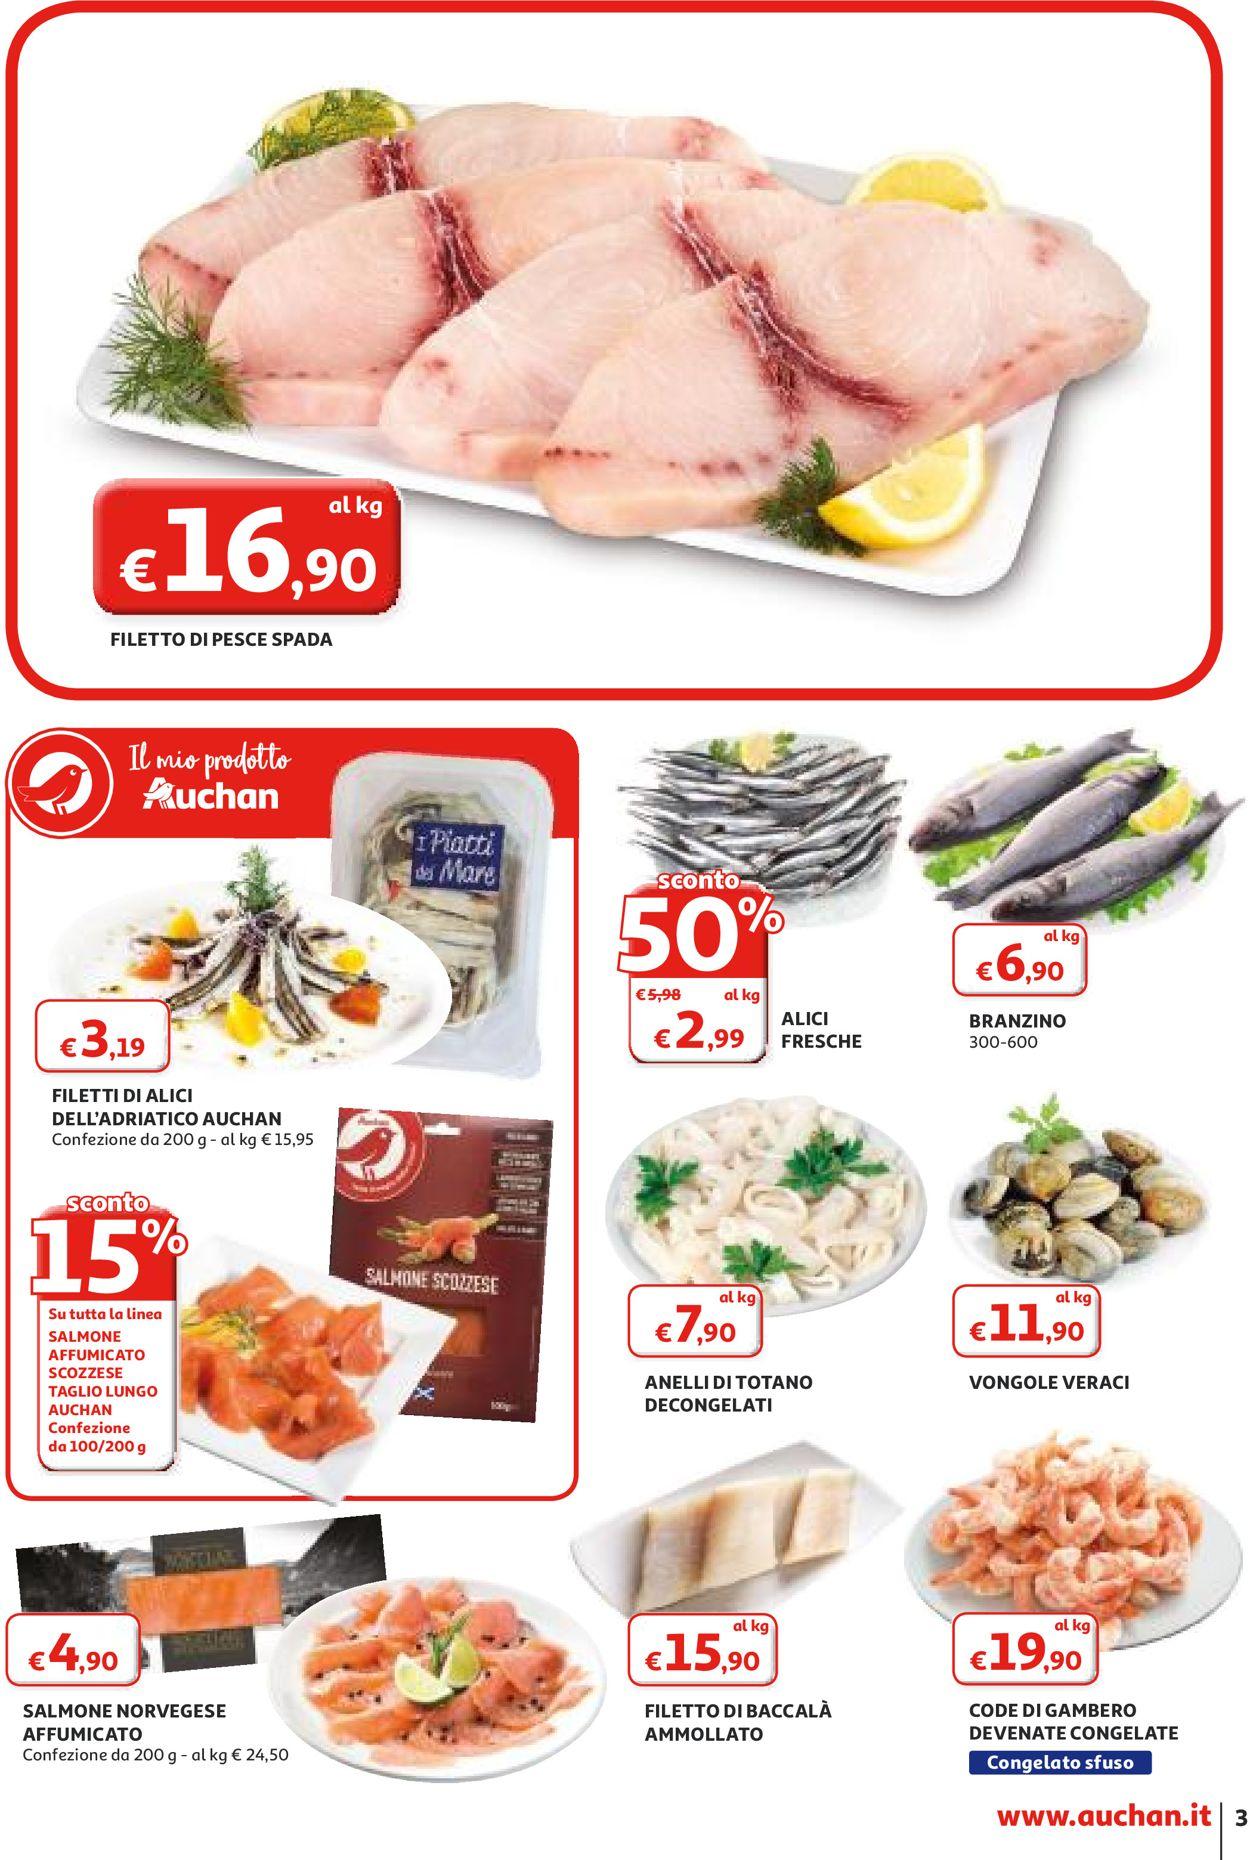 Volantino Auchan - Offerte 06/02-16/02/2020 (Pagina 3)